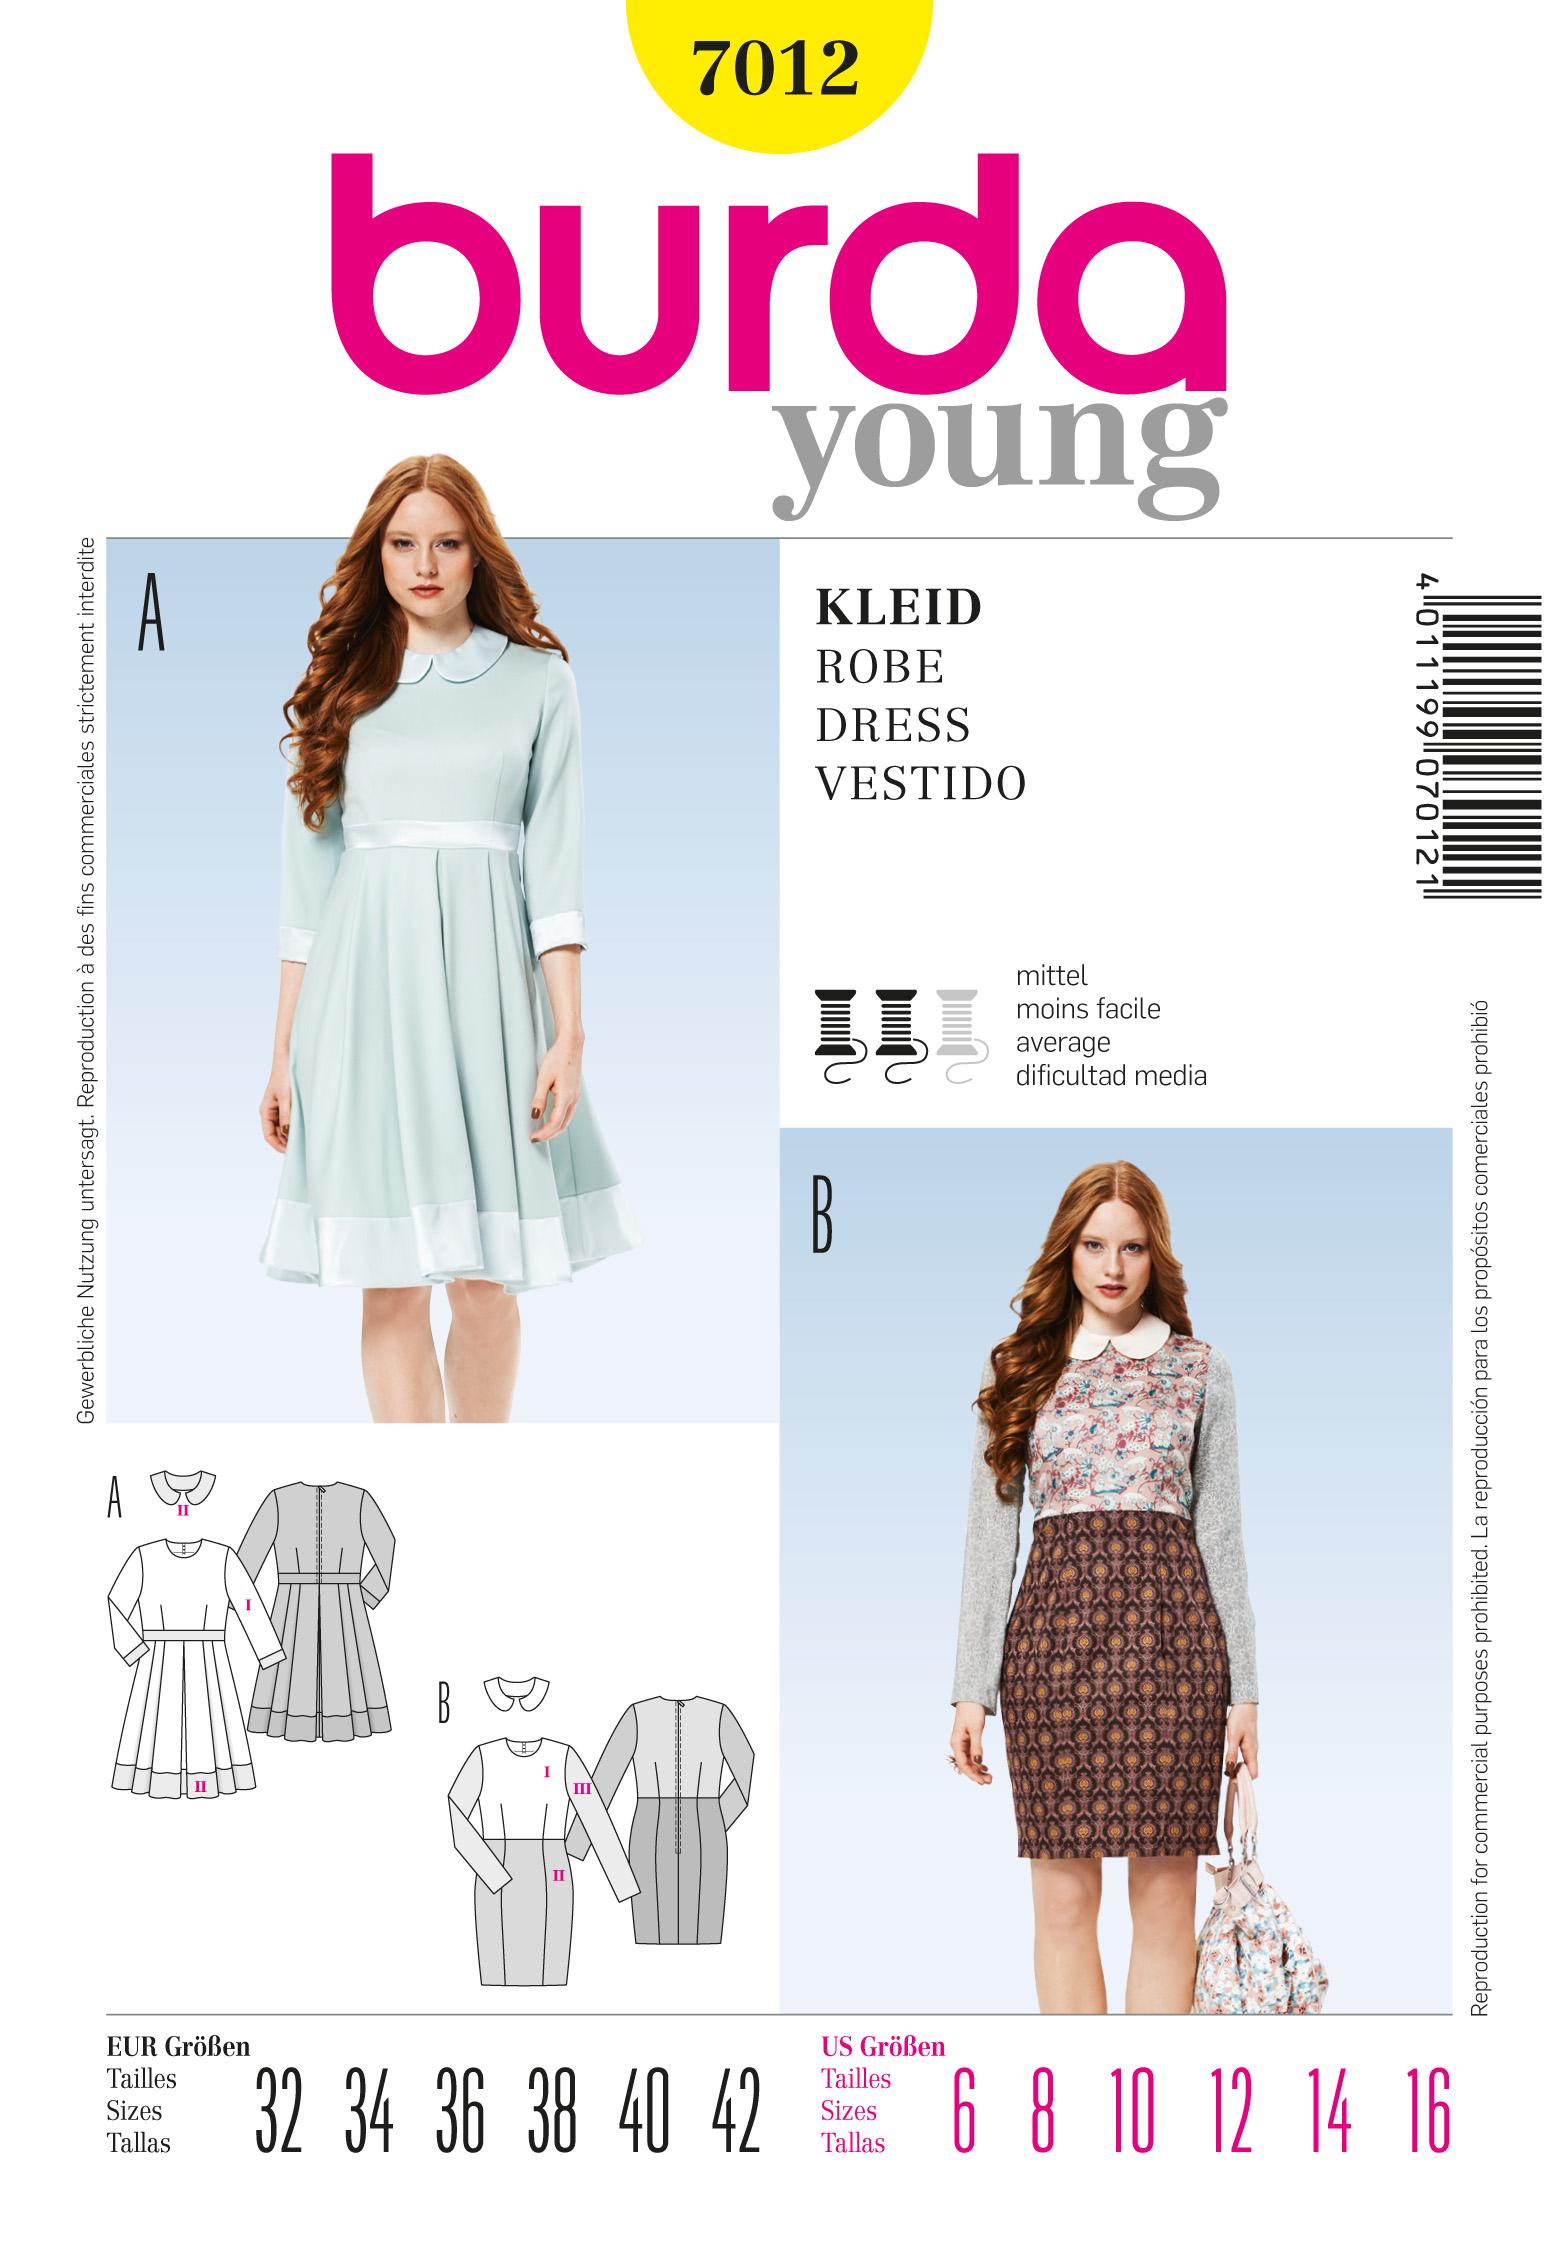 Burda Dress 7012